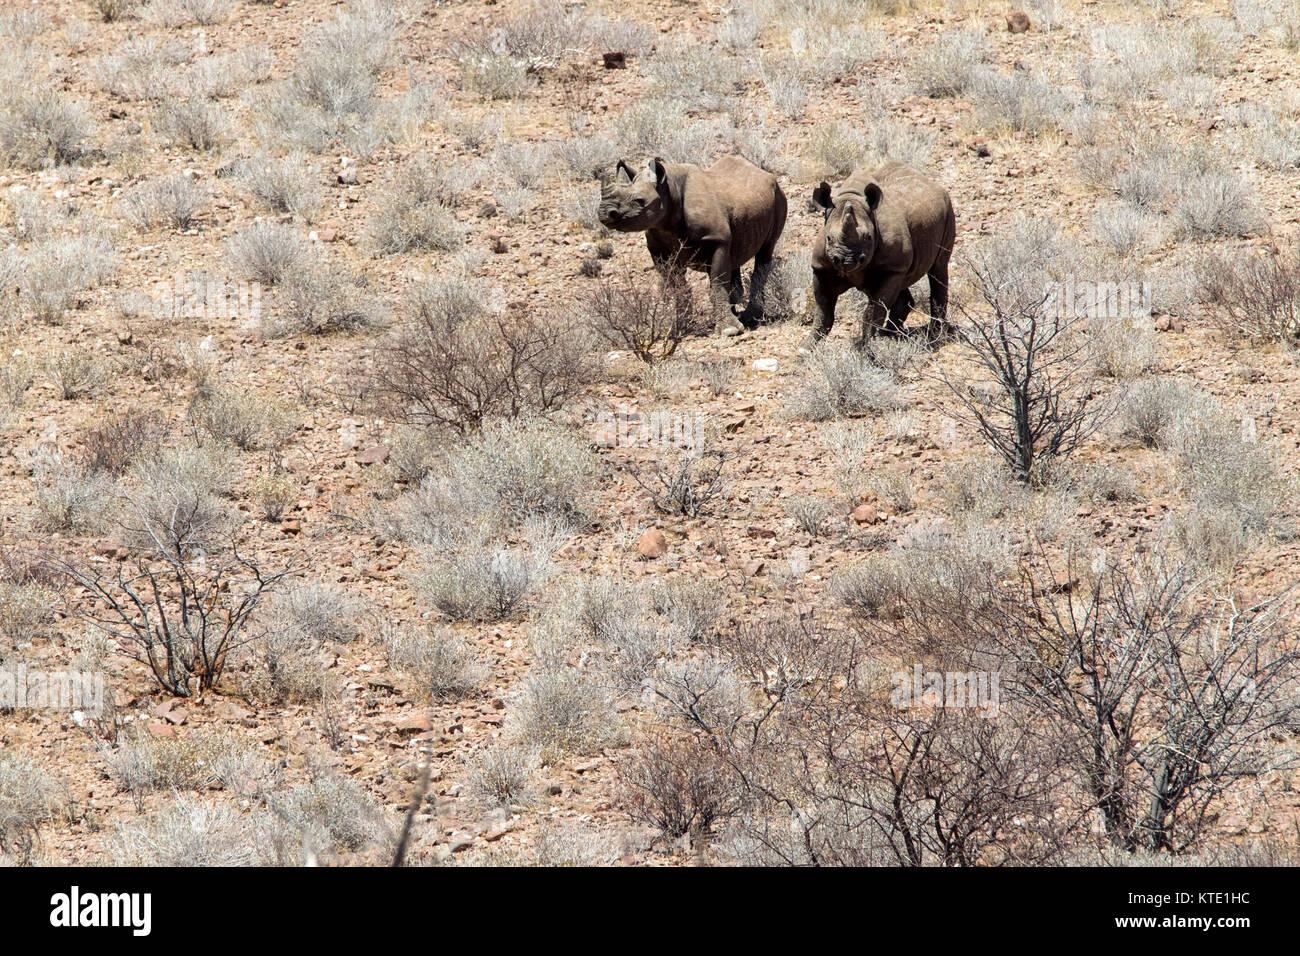 Black rhinoceros or hook-lipped rhinoceros (Diceros bicornis) at Huab Under Canvas, Damaraland, Namibia, Africa - Stock Image